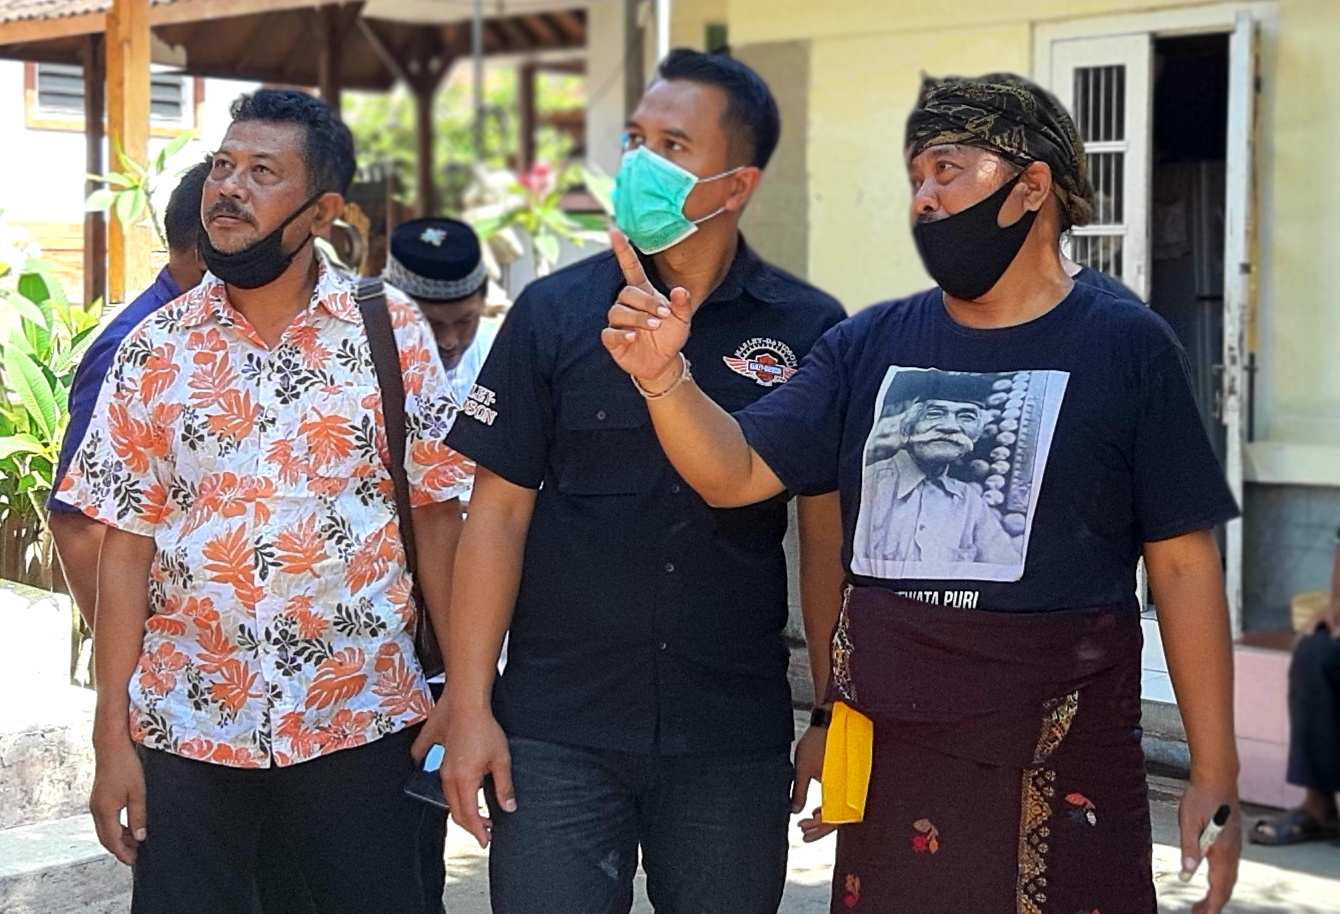 Foto: Kompol Endang Tri Purwanto (tengah) bersama Tokoh Puri Gerenceng AA. Ngurah Agung (kanan).